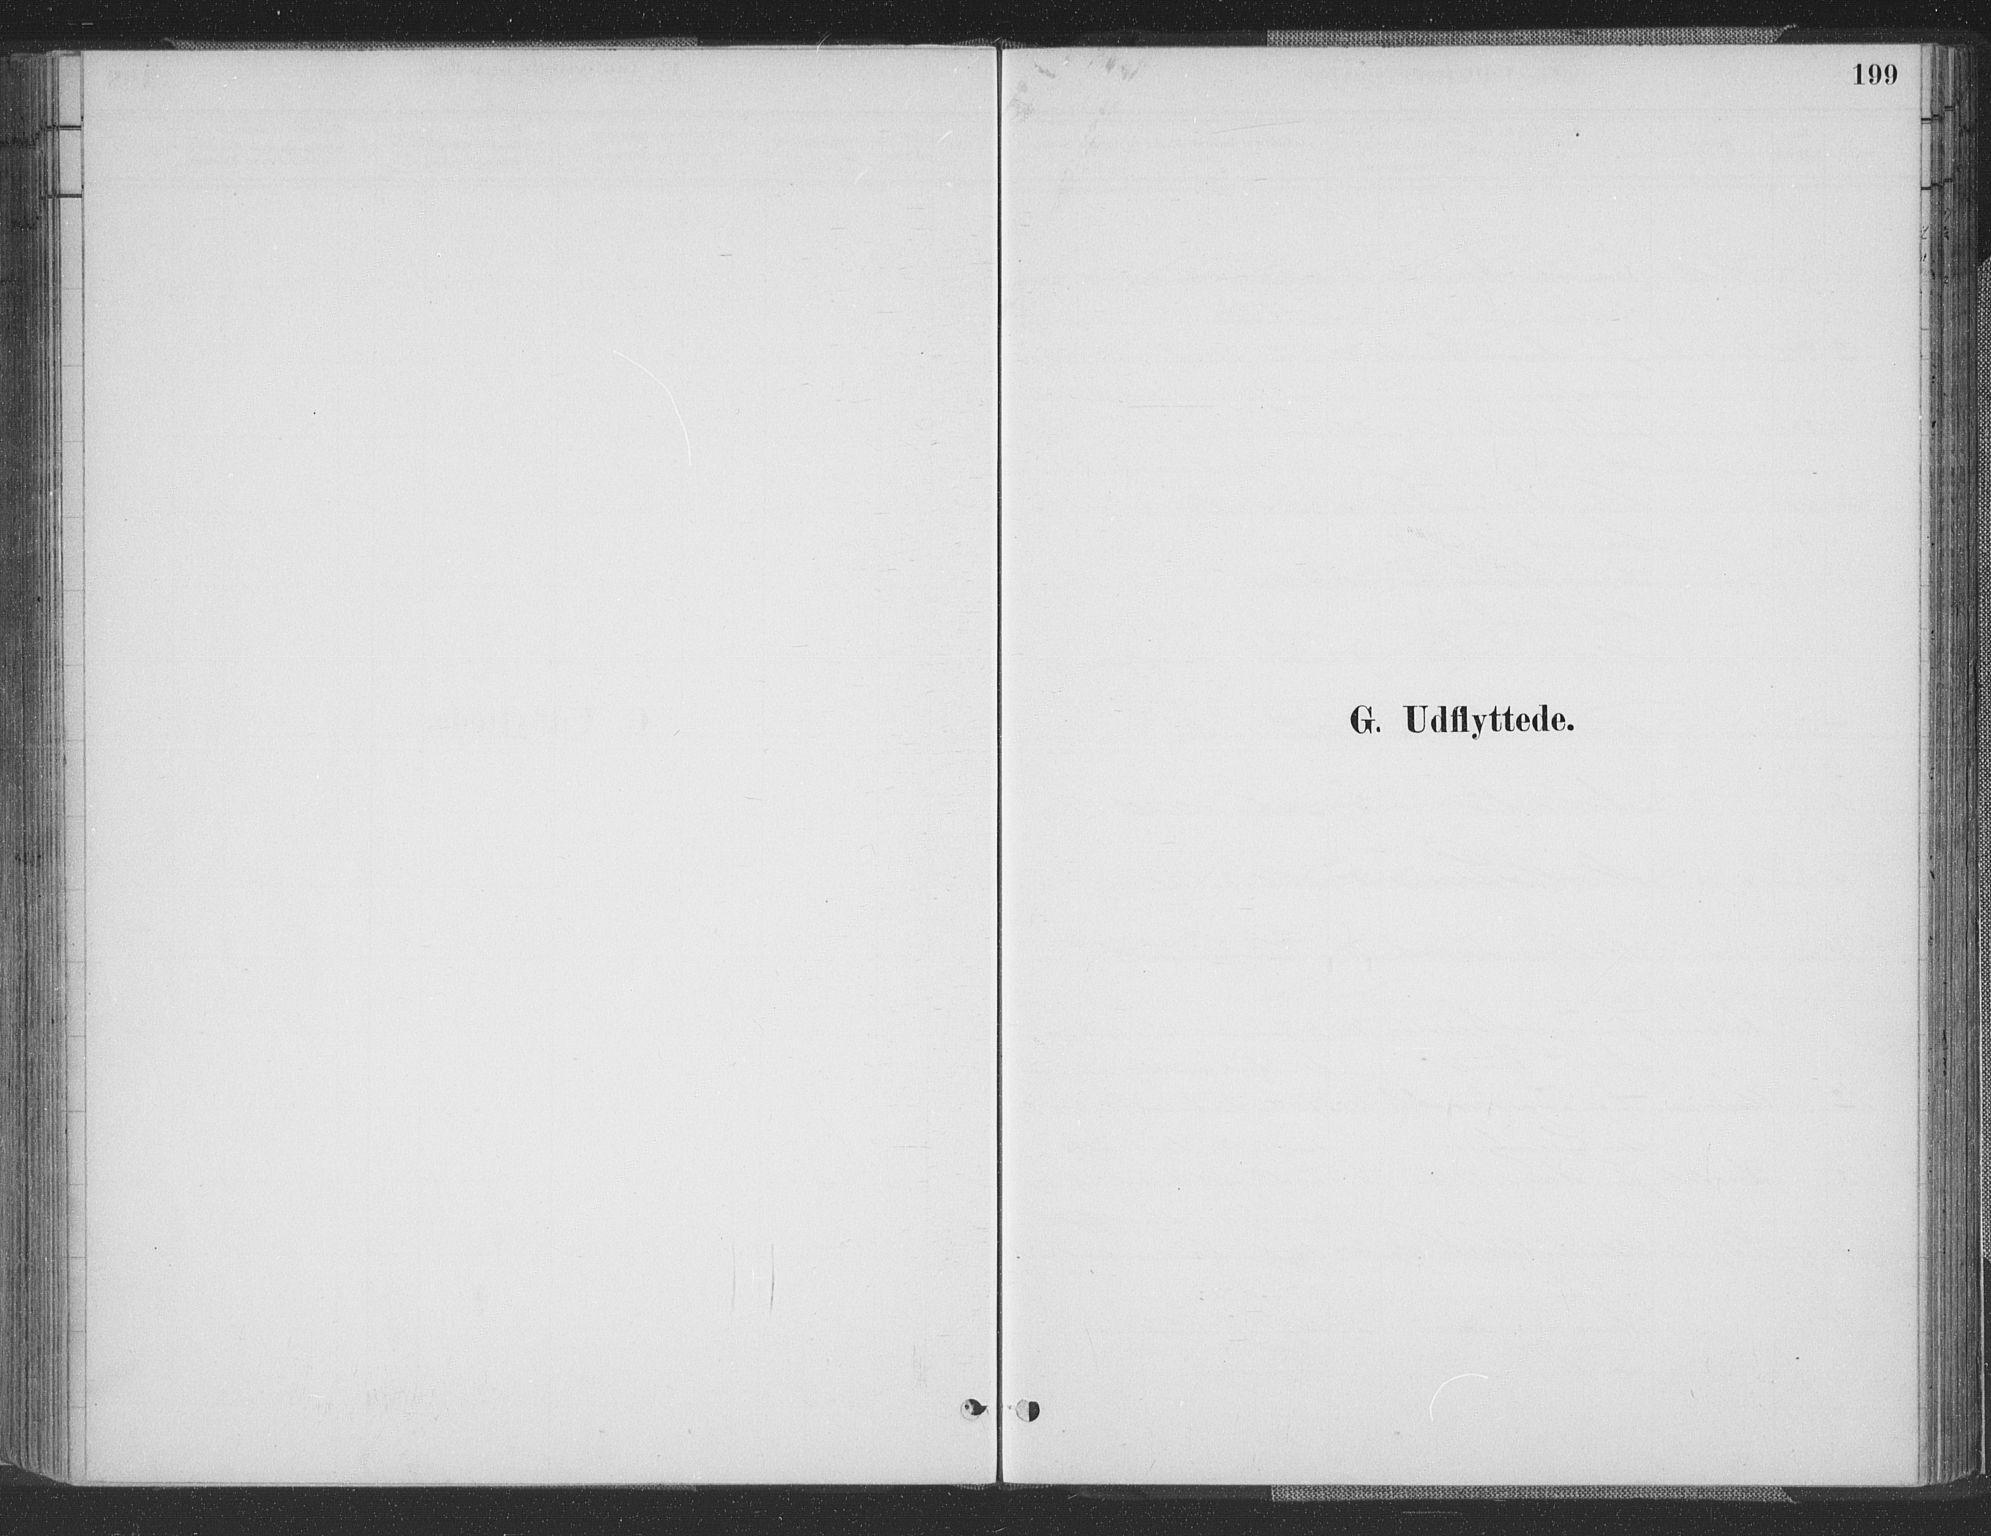 SAK, Grimstad sokneprestkontor, F/Fa/L0004: Ministerialbok nr. A 3, 1882-1910, s. 199